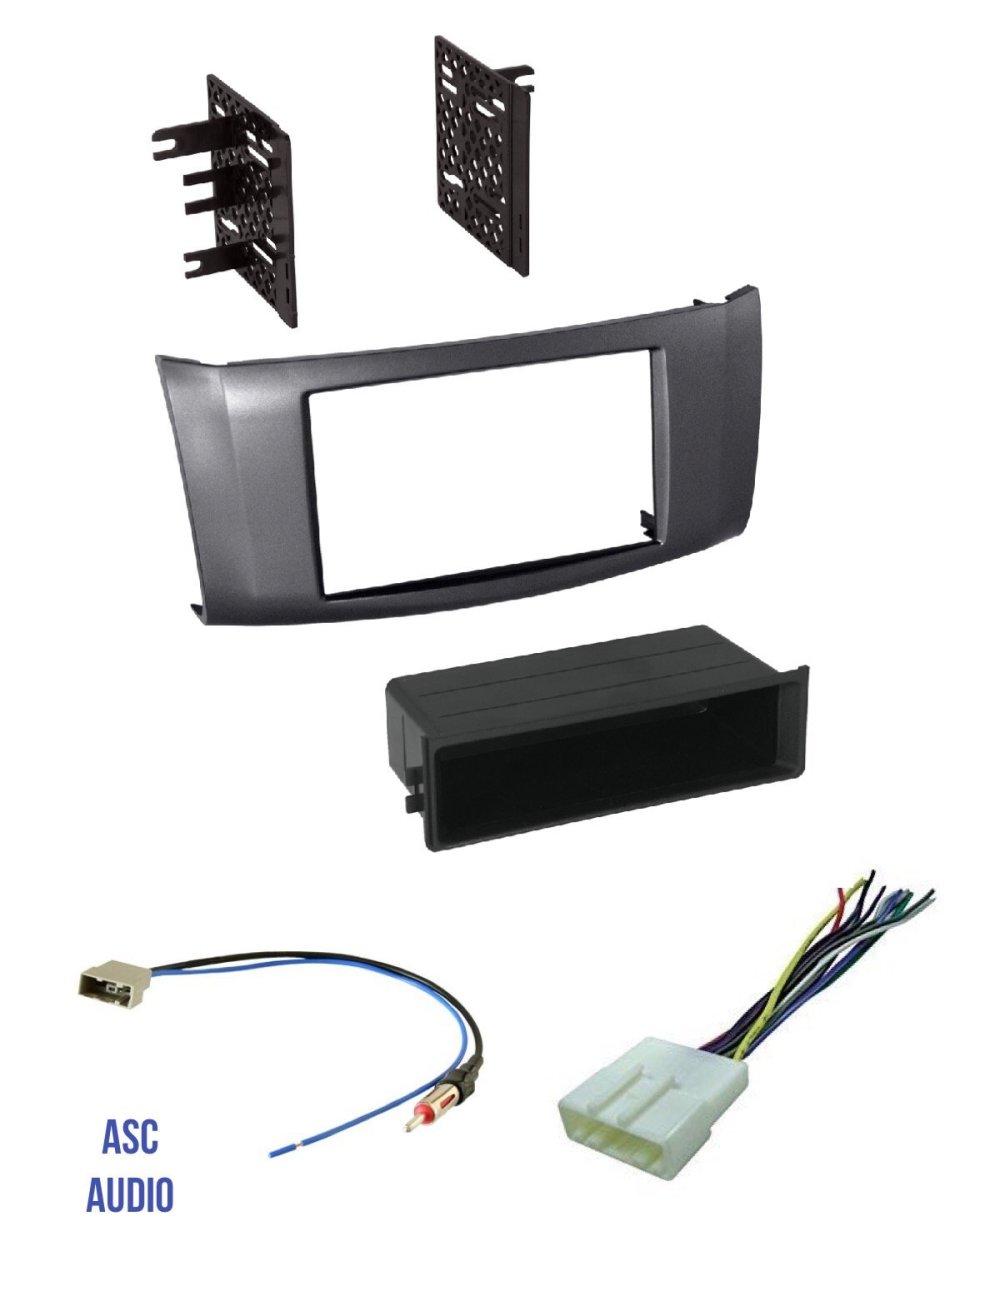 medium resolution of cheap sentra dash find sentra dash deals on line at alibaba com dash kit nissan sentra 00 01 02 03 2000 car radio wiring installation